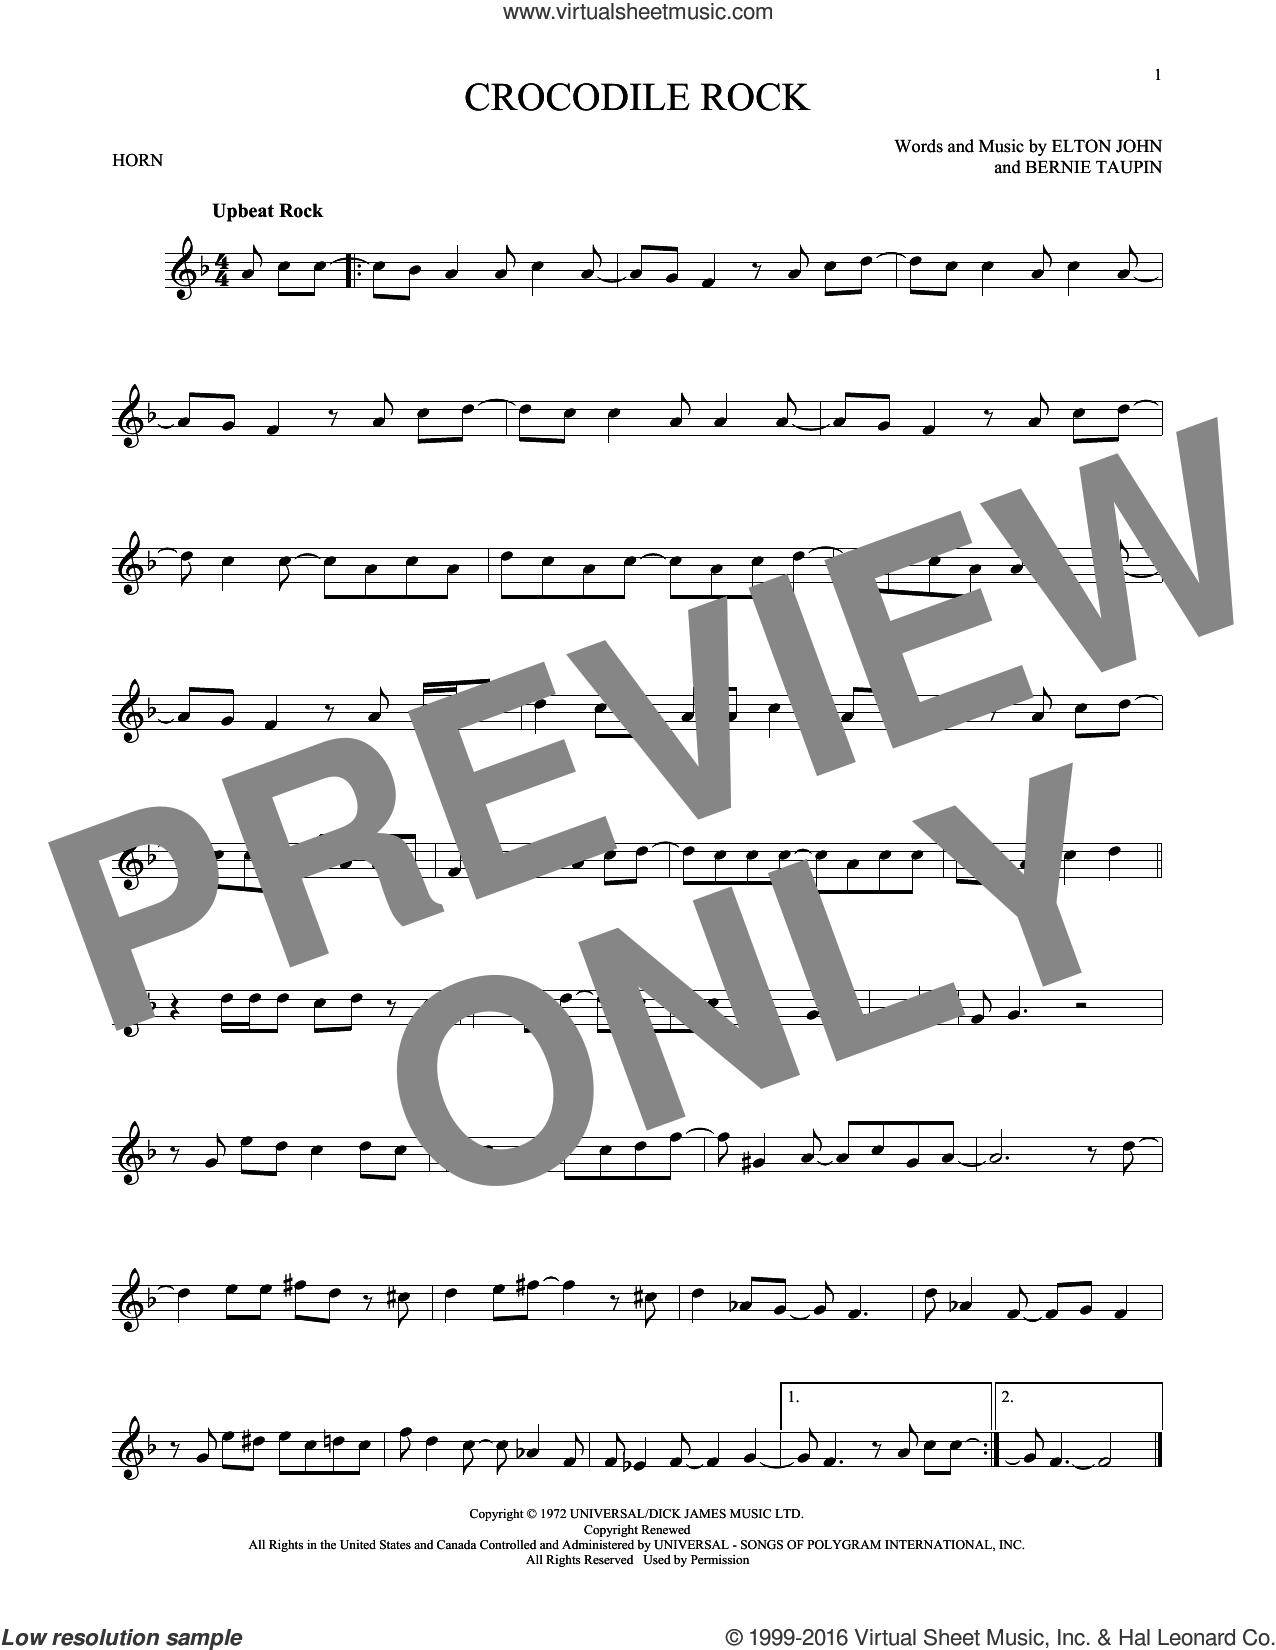 Crocodile Rock sheet music for horn solo by Elton John and Bernie Taupin, intermediate skill level